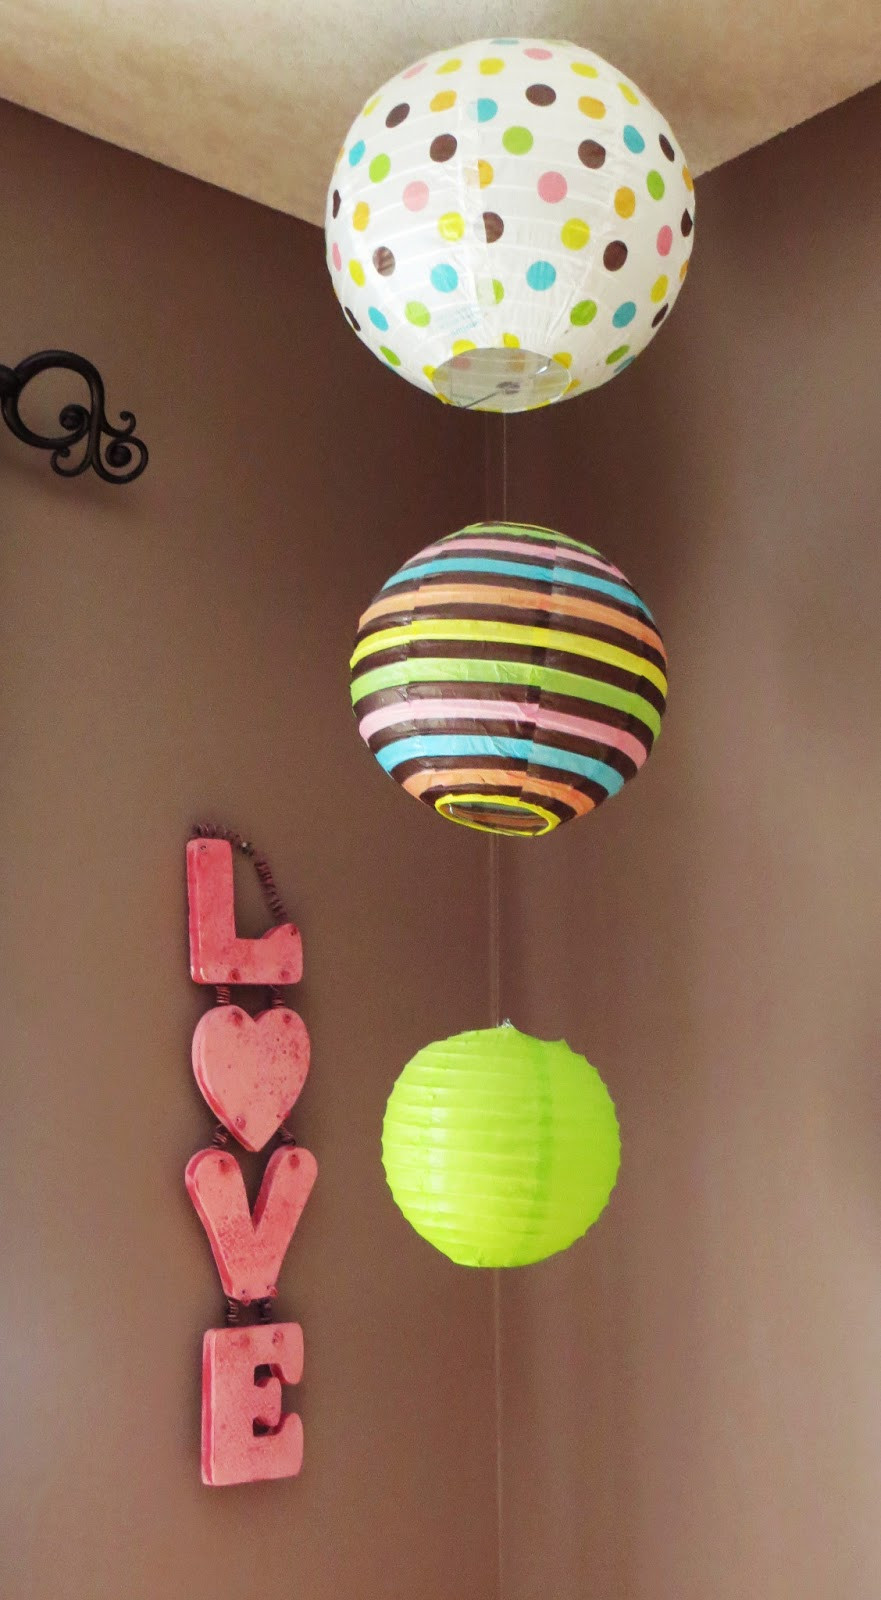 DIY Room Decorations For Girls  Namely Original DIY Teen Girl Room Decor